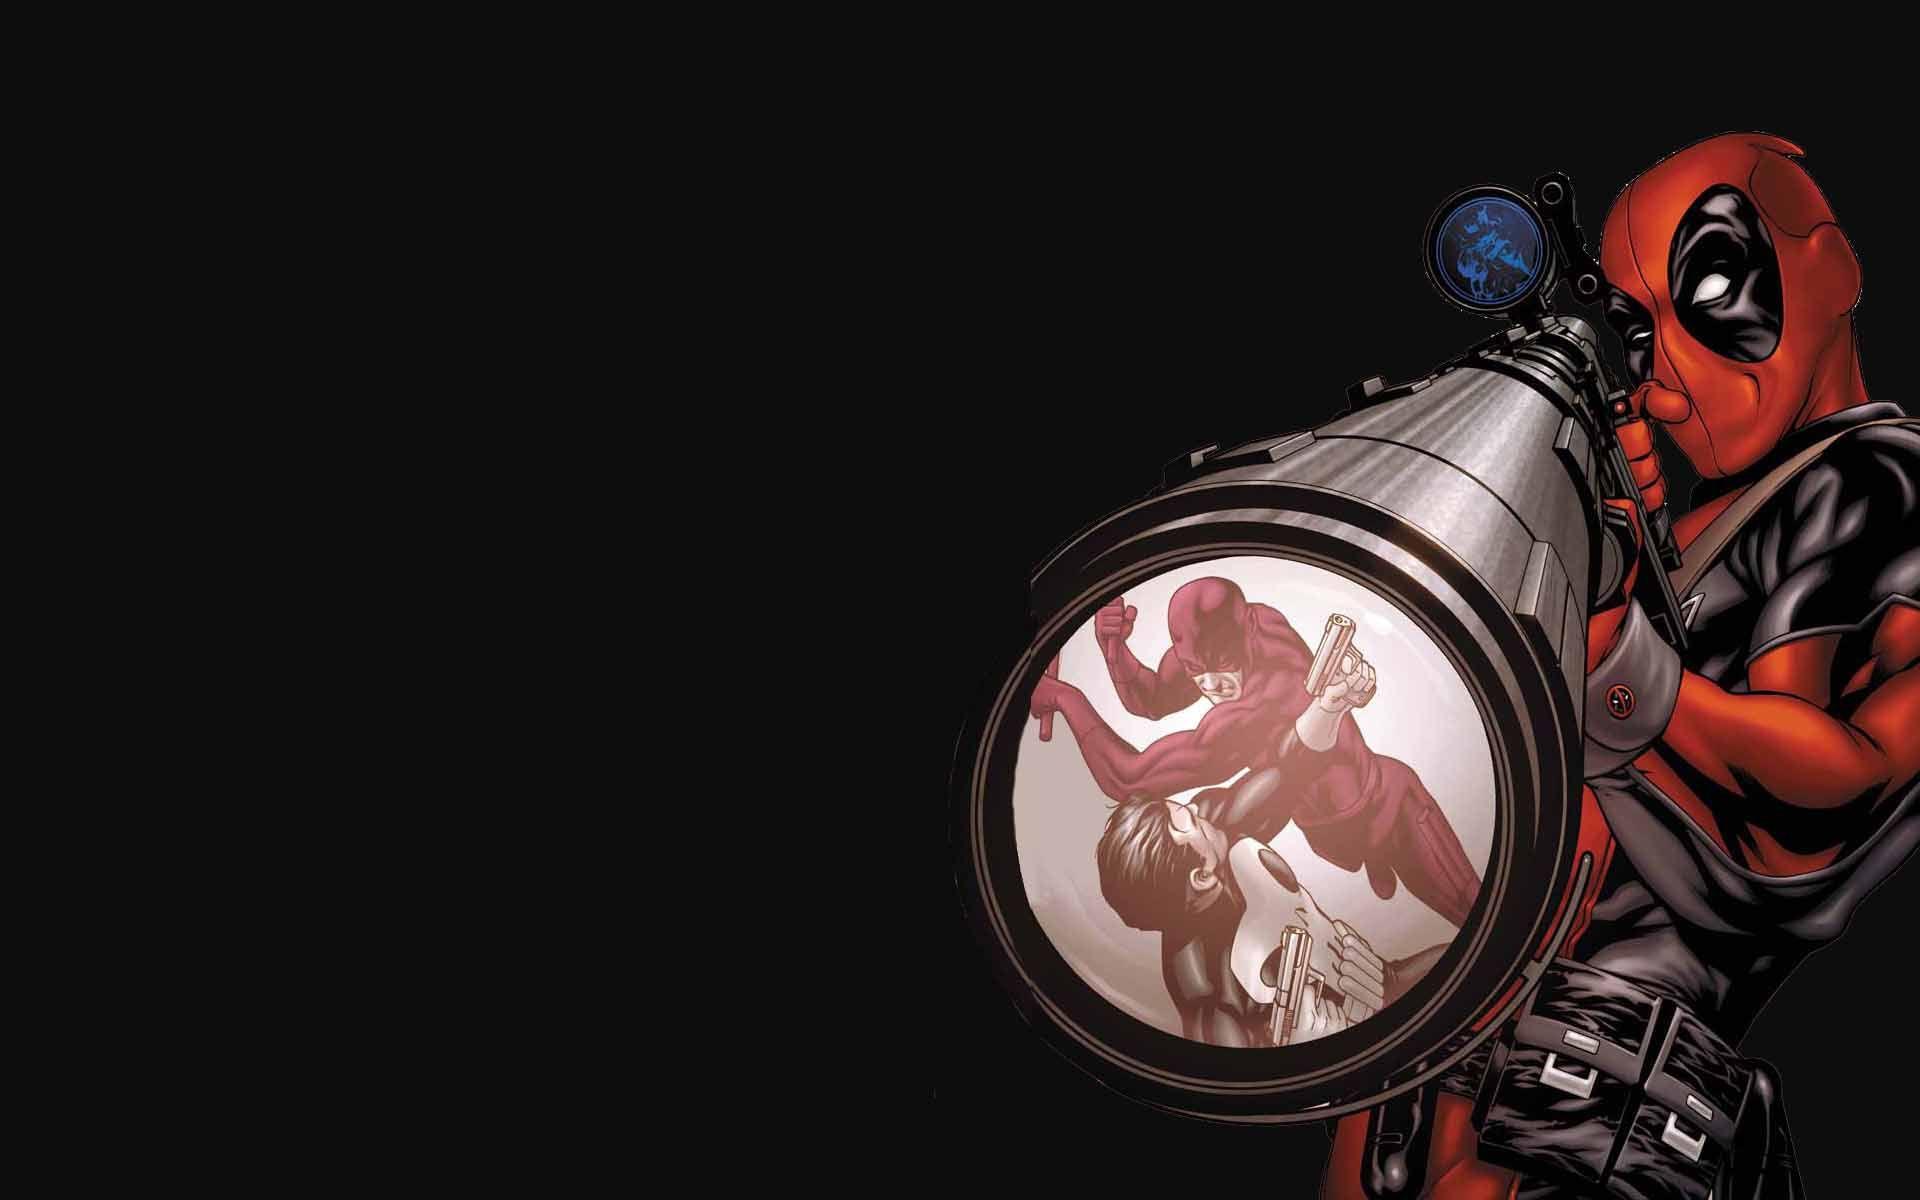 Best Movie Deadpool Wallpaper 2017 Comic Book Superhero S